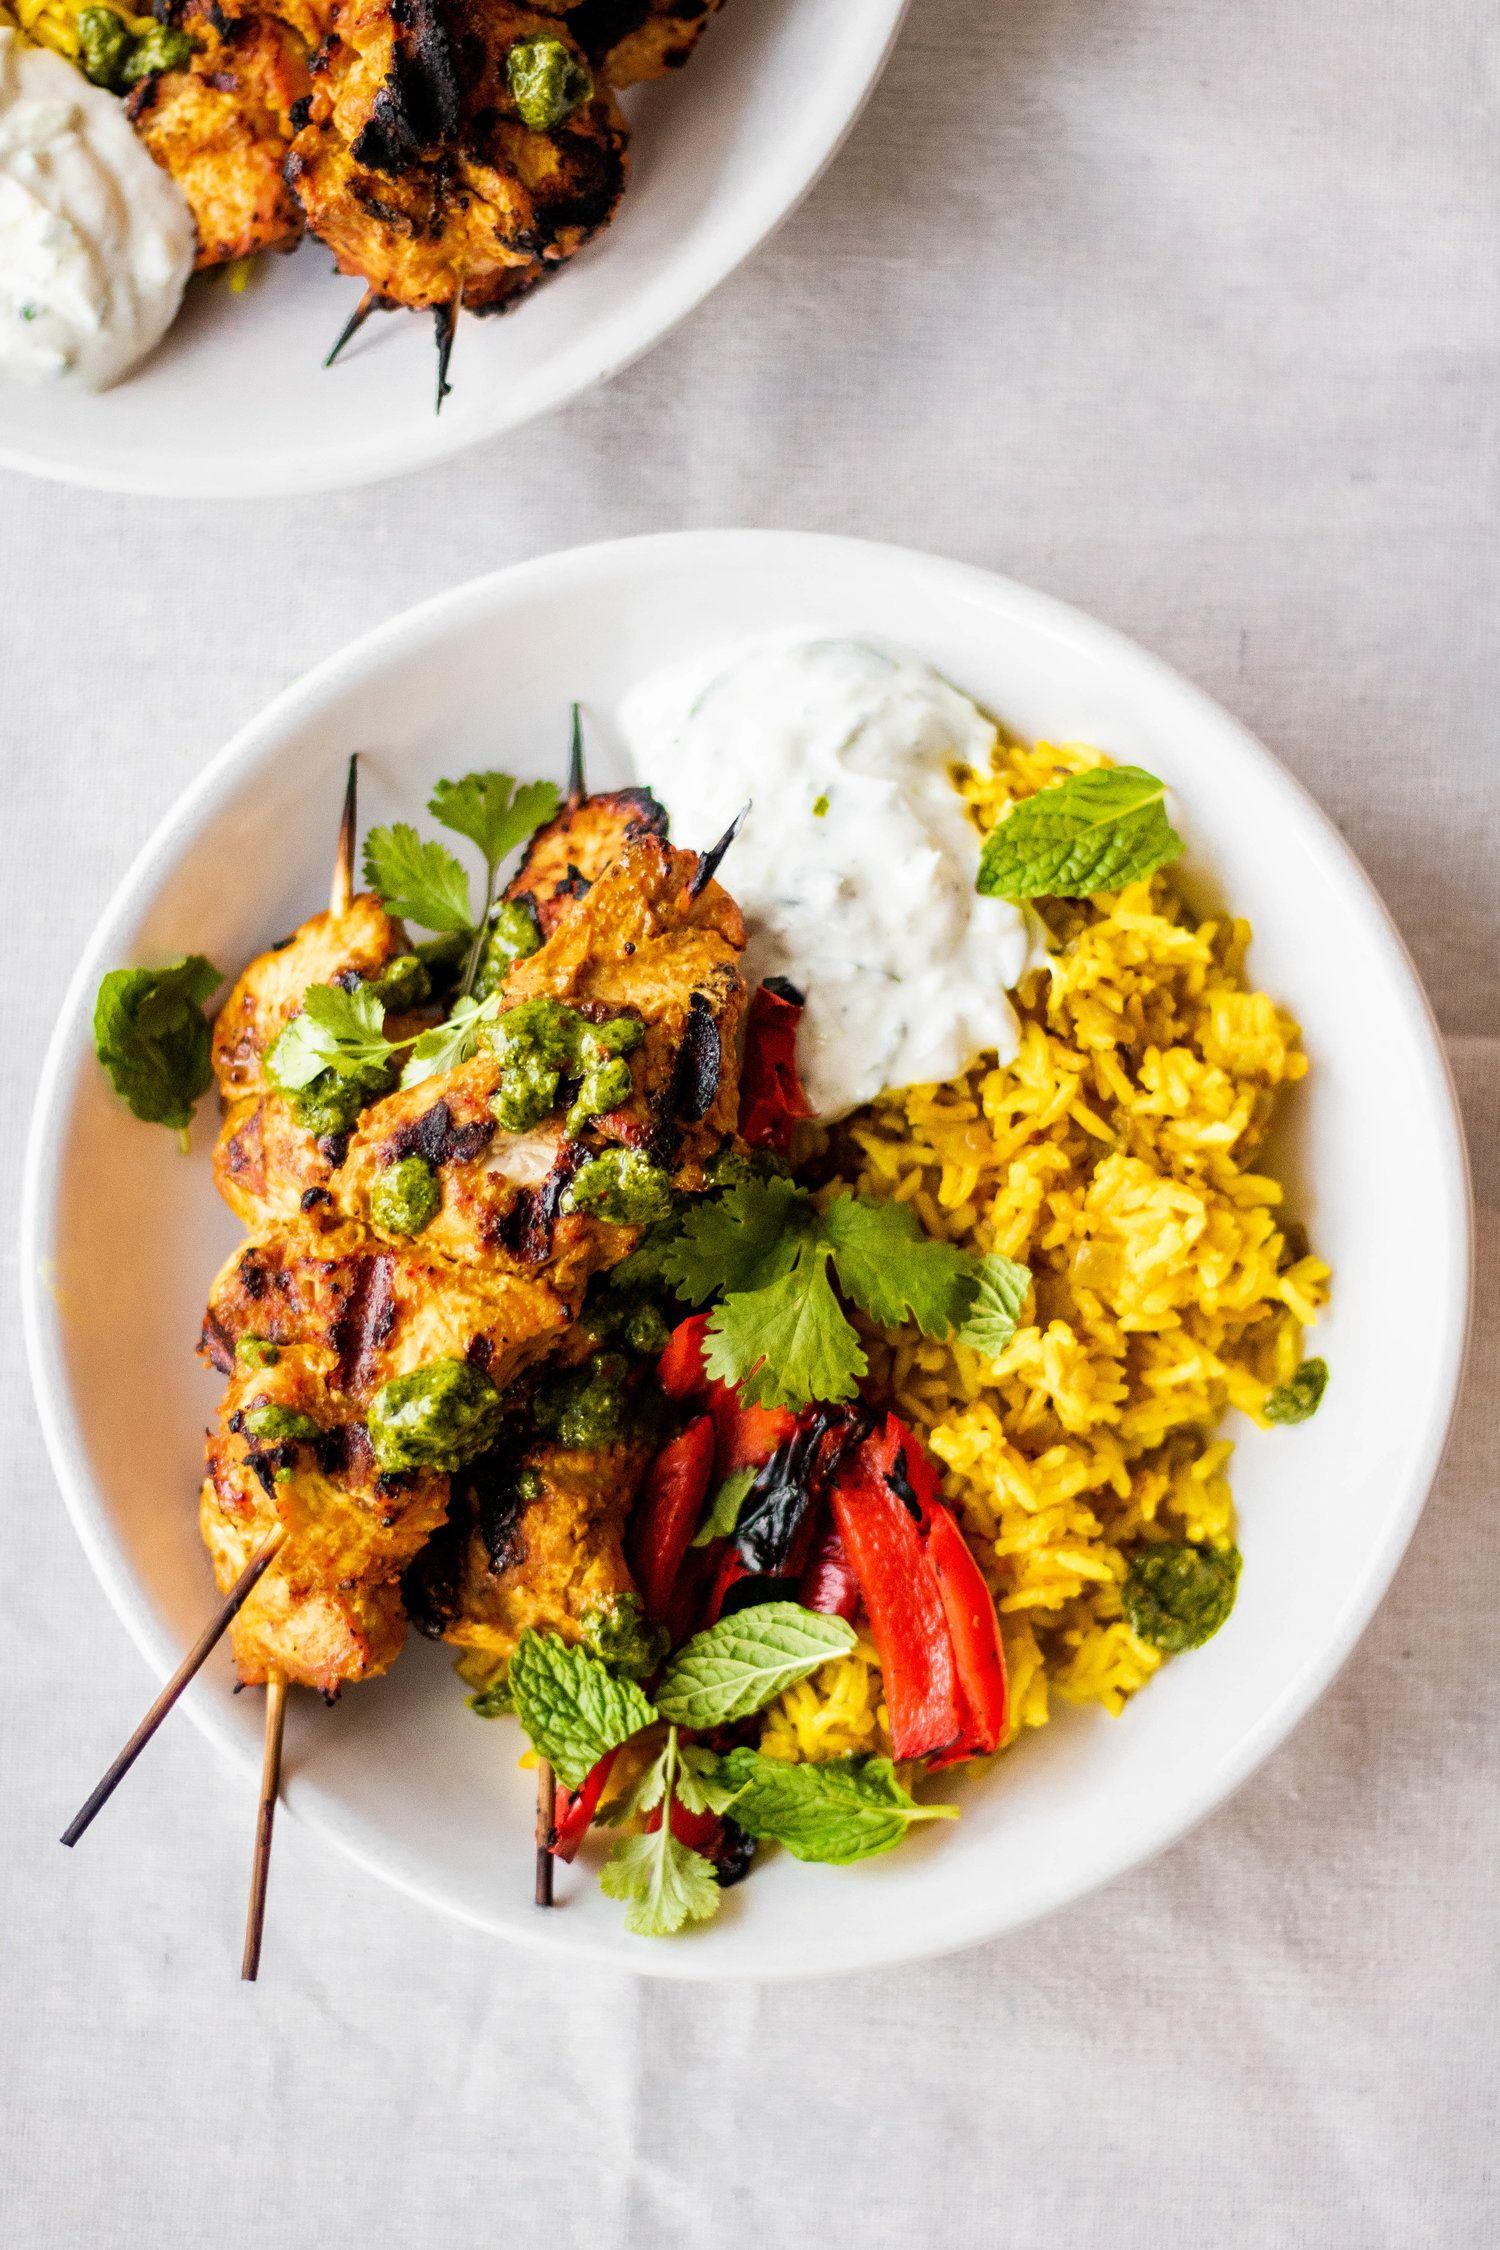 Tandoori Chicken Bowls with Cumin-Turmeric Rice and Spicy Cilantro Chutney #tandoorichicken